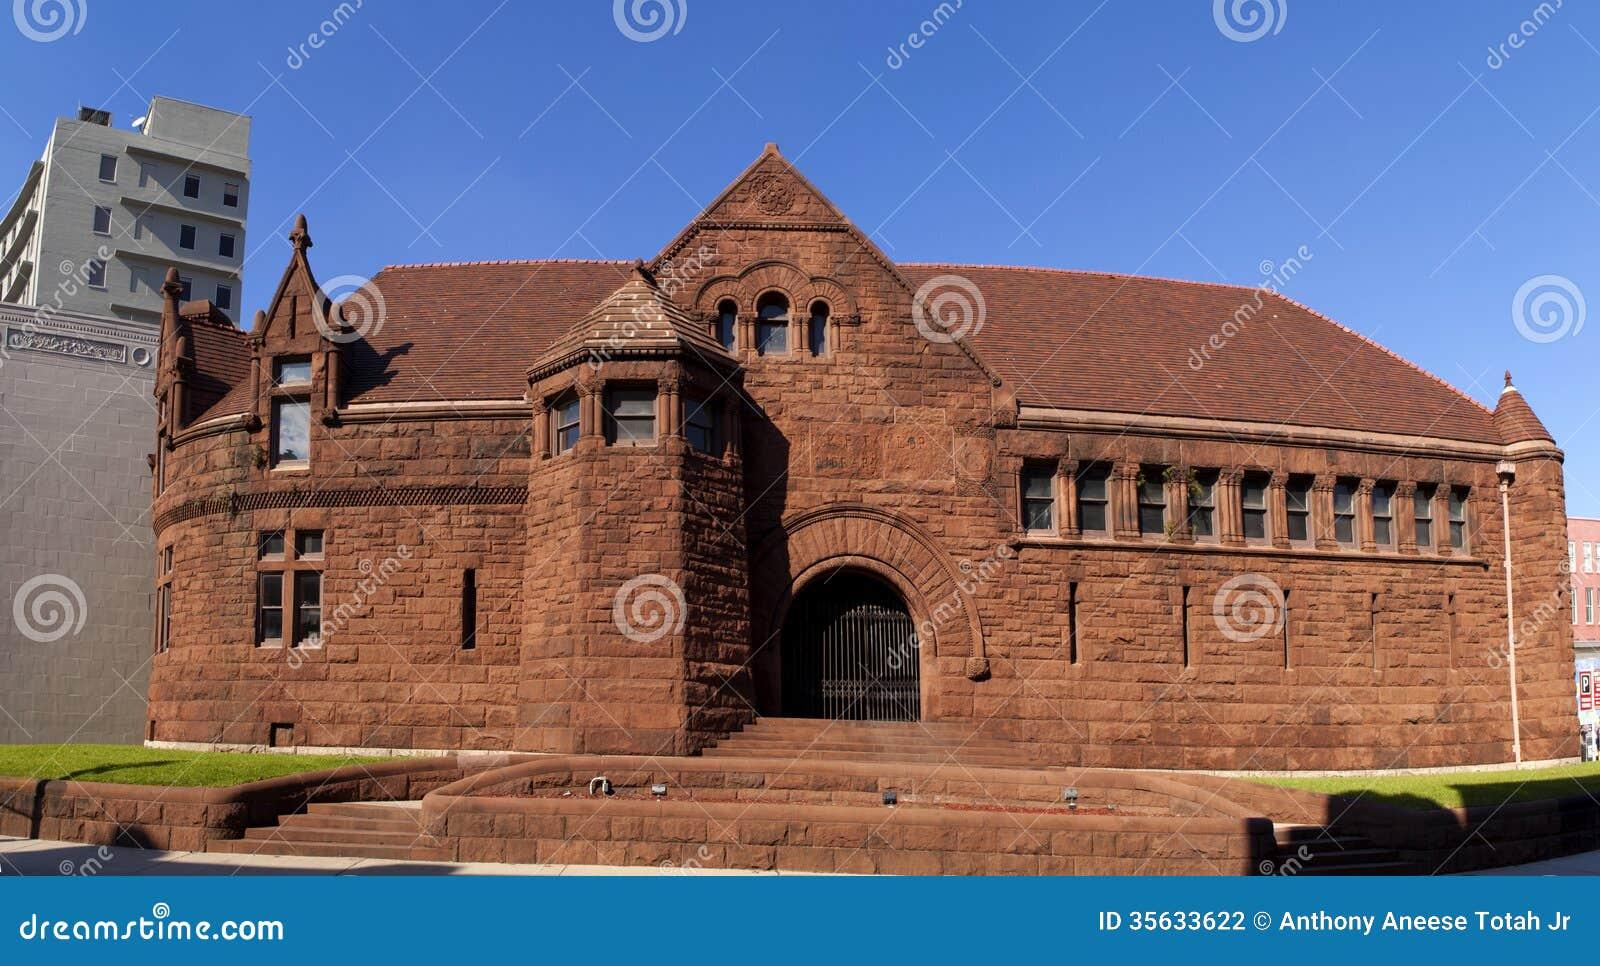 Romanesque Revival Architecture: romanesque revival (1890) editorial ...